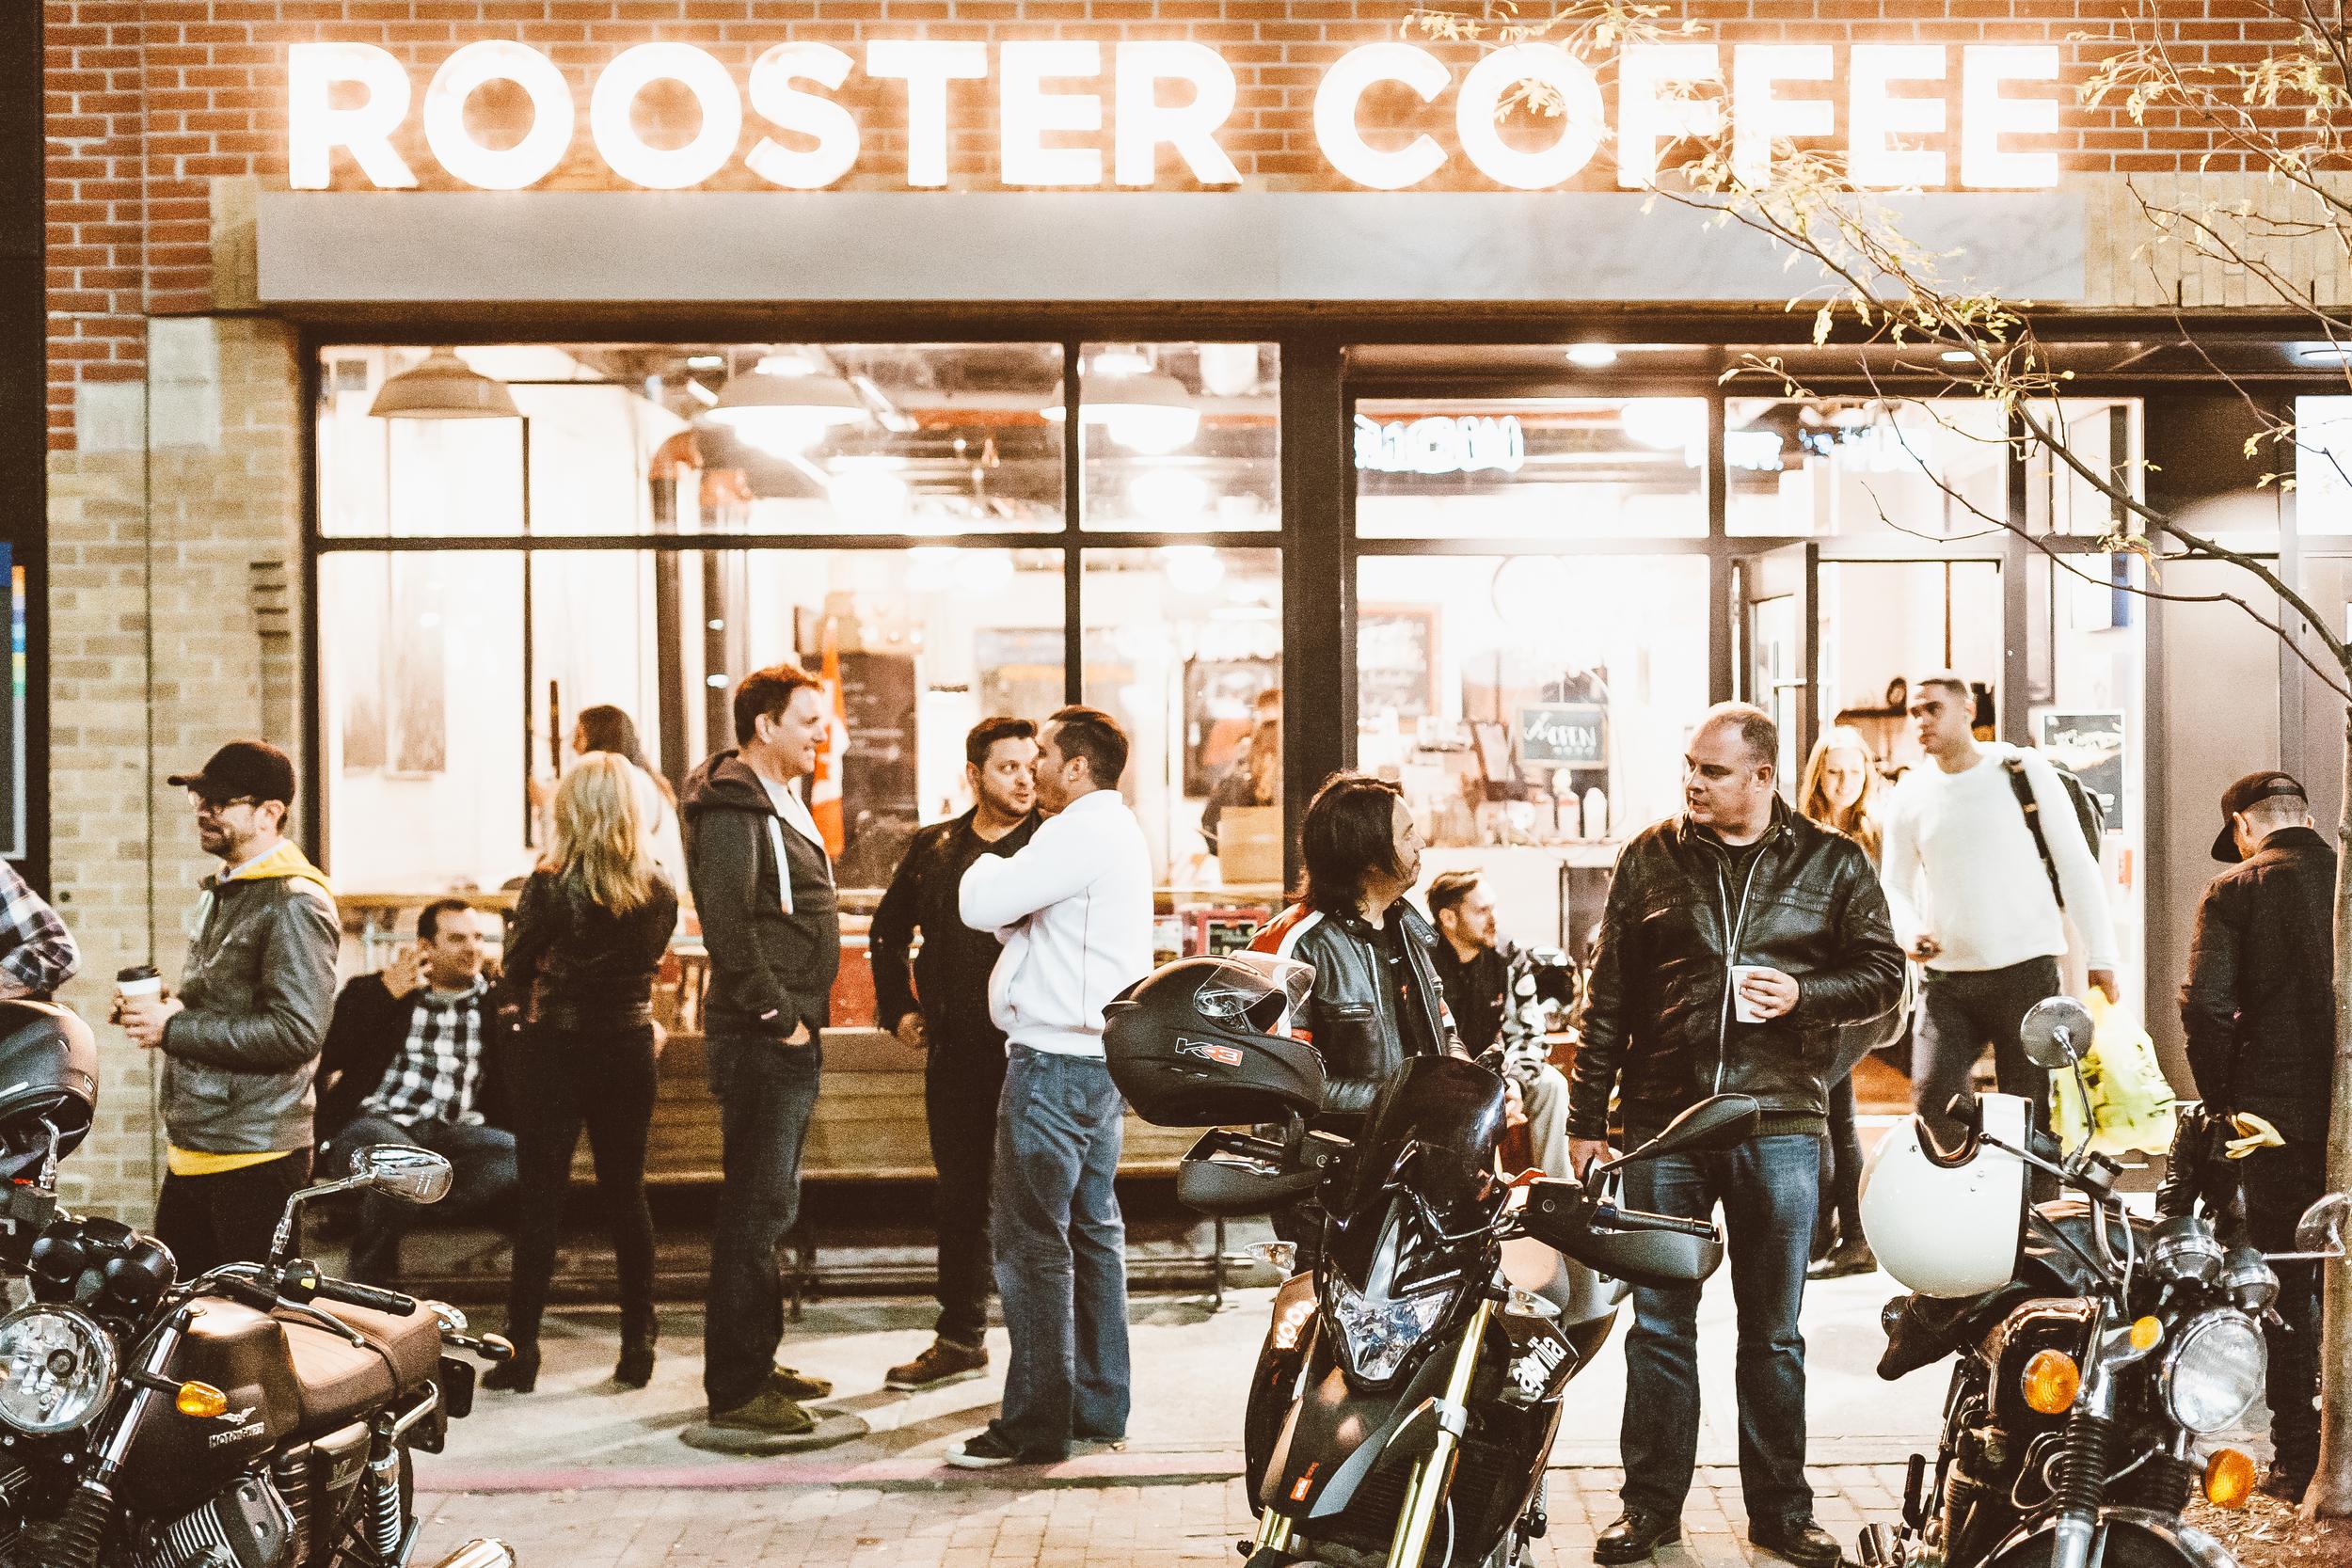 #TheMotoSocialTORONTO   Oct. 1, 2014   Rooster Coffee   TheMotoSocial.com   10.jpg